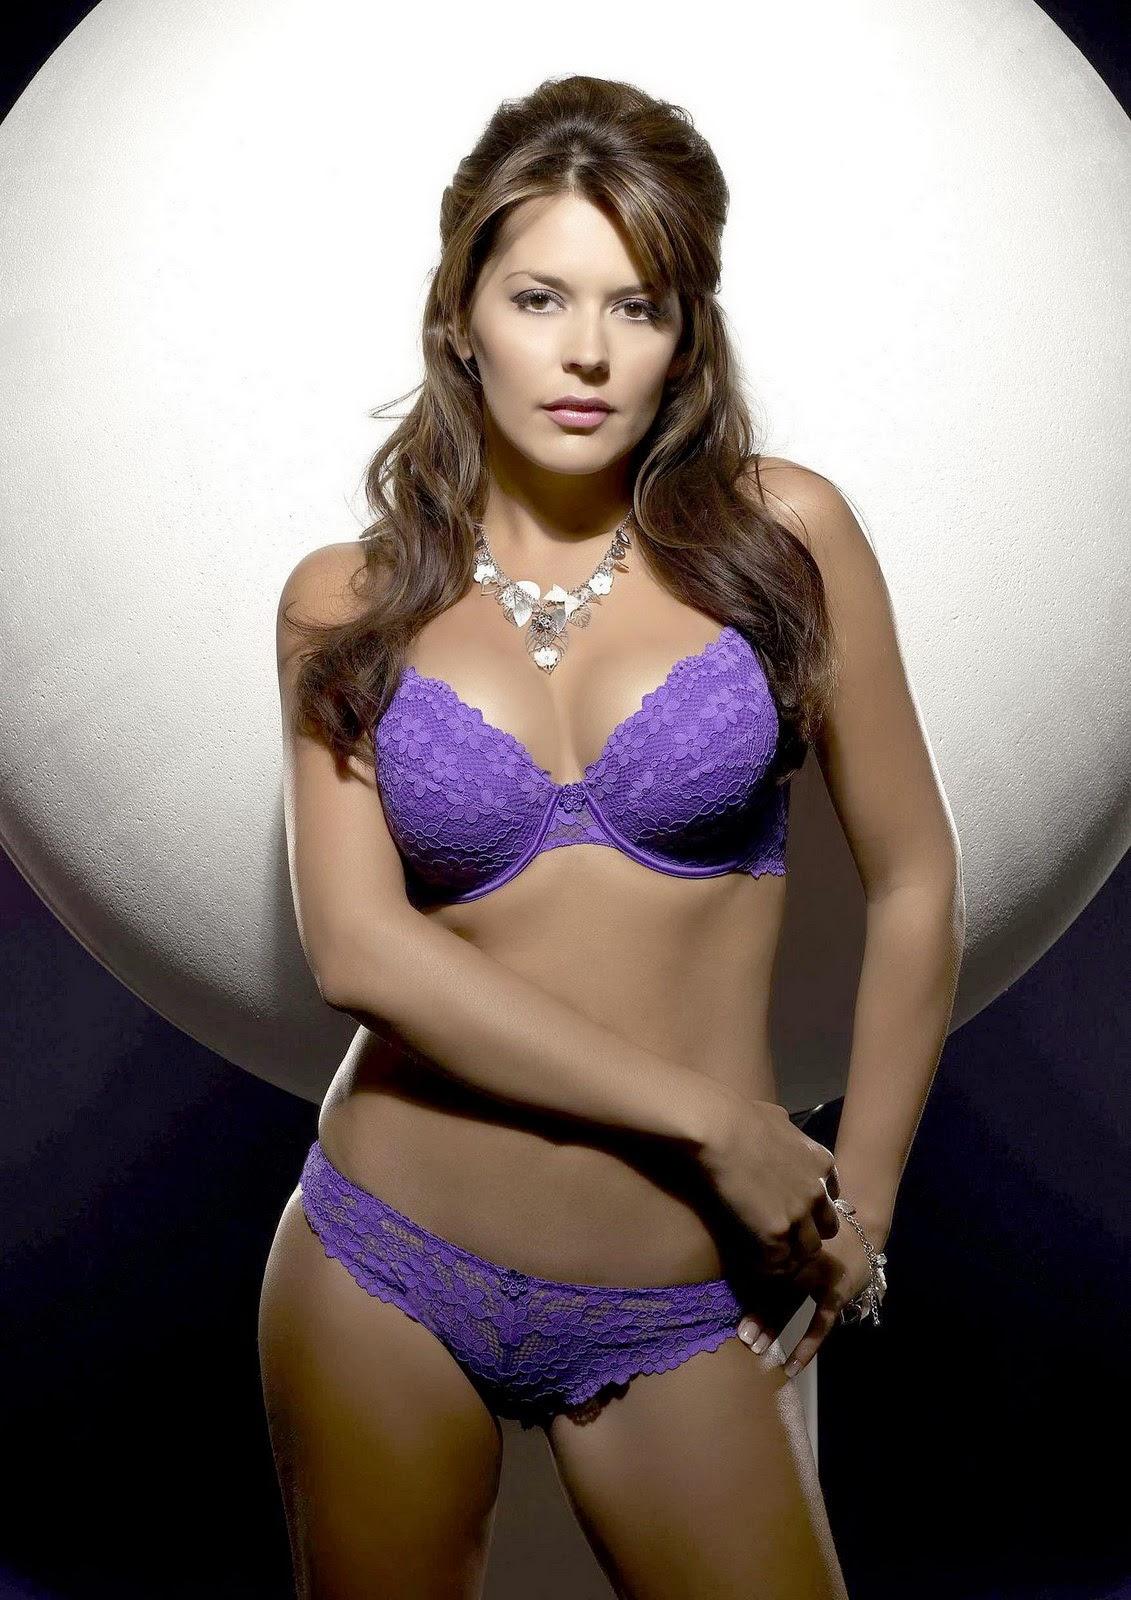 Ex-Virgin Atlantic Beauty: Danielle Lineker Bux a lingerie model ... | 1131 x 1600 jpeg 318kB